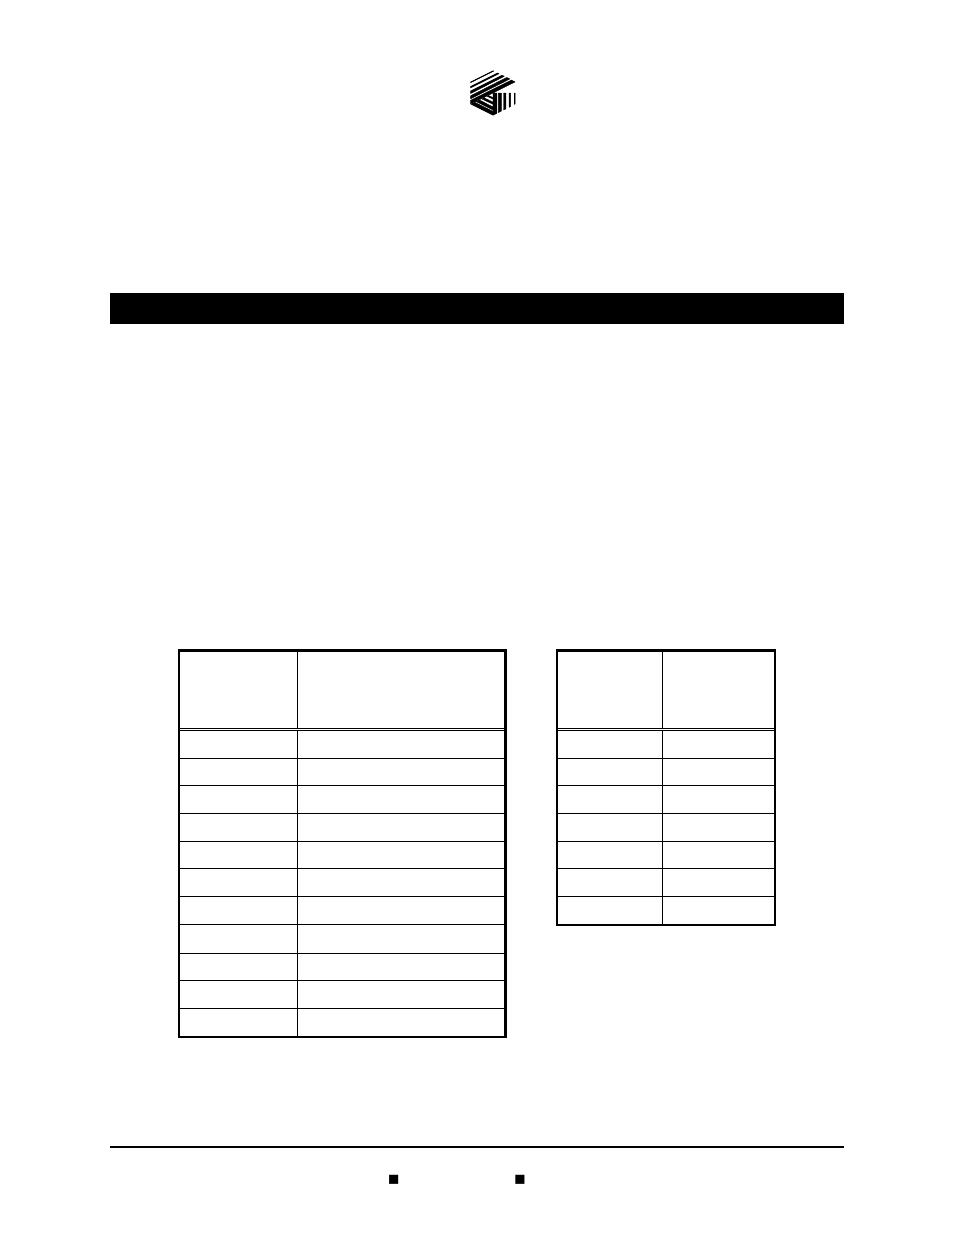 GAI-Tronics 12250-001 VLC Kit User Manual | 8 pages